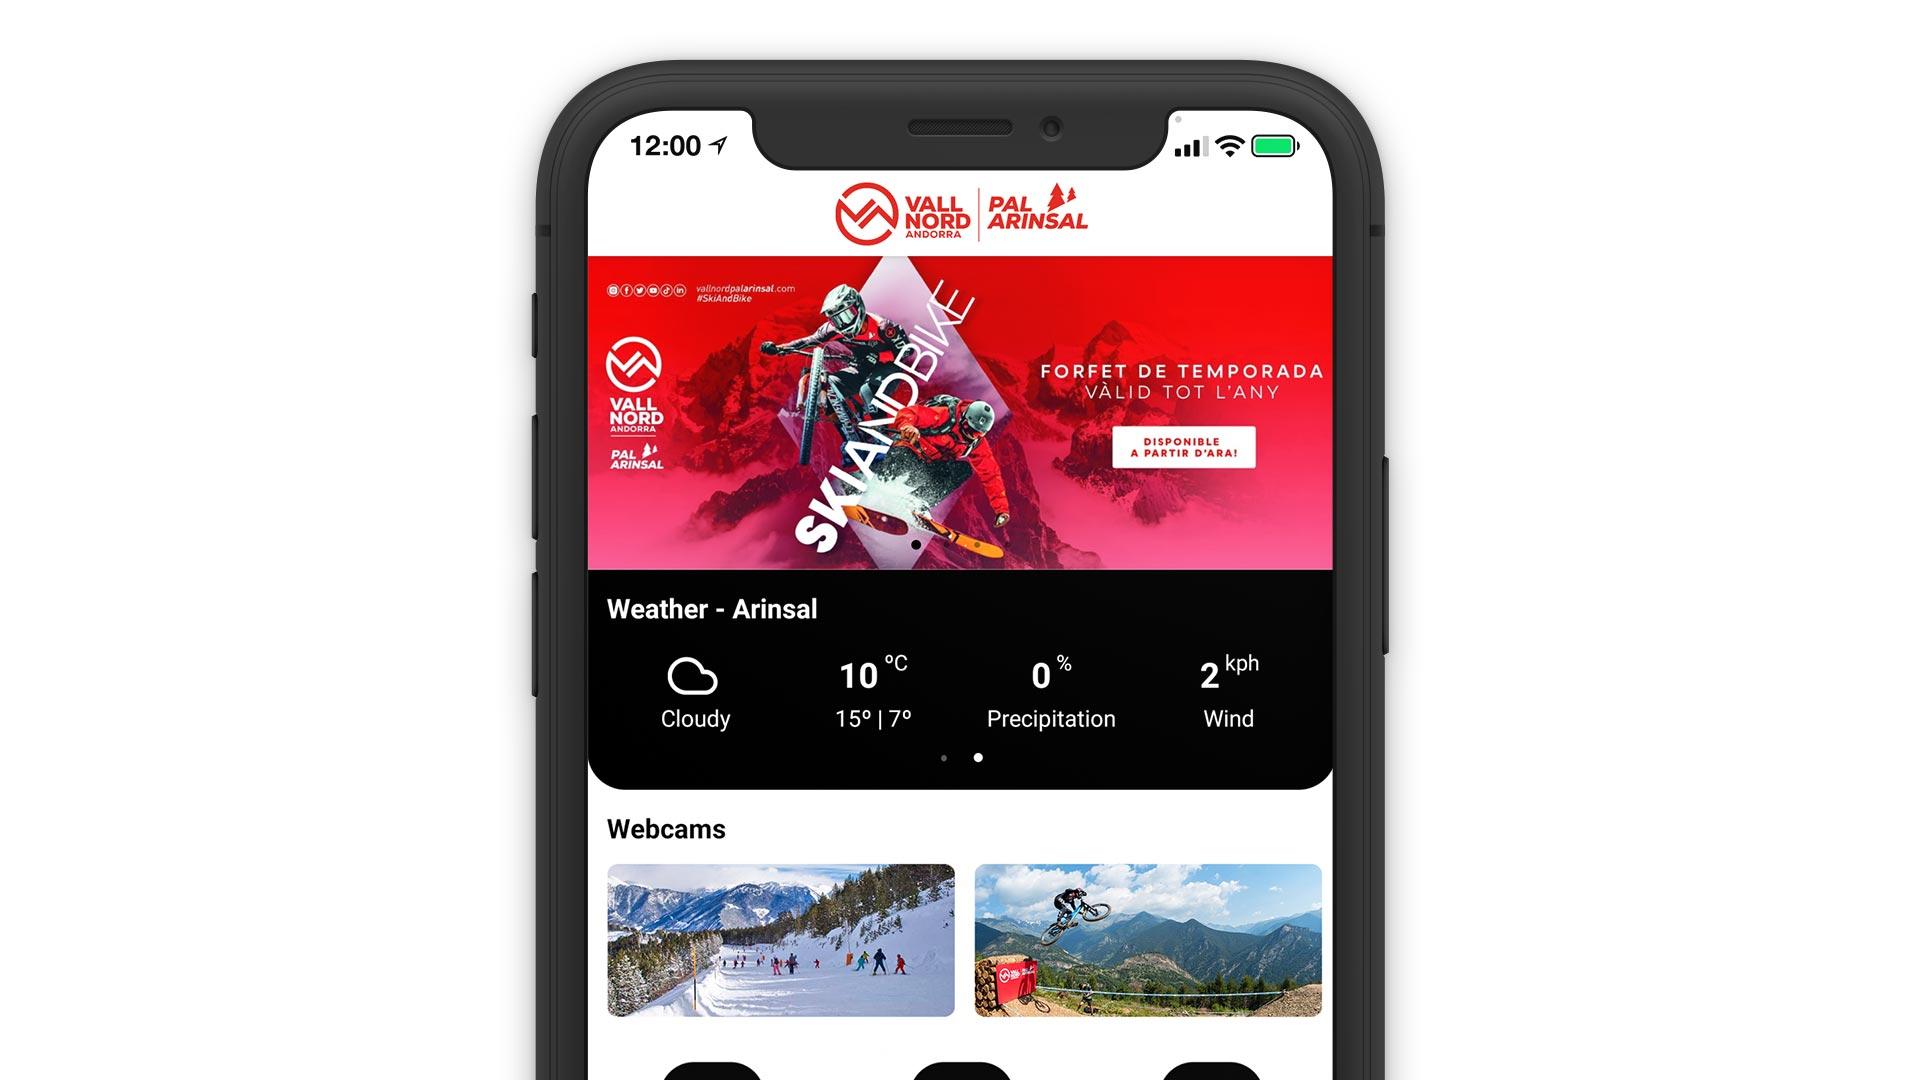 Vallnord App homescreen